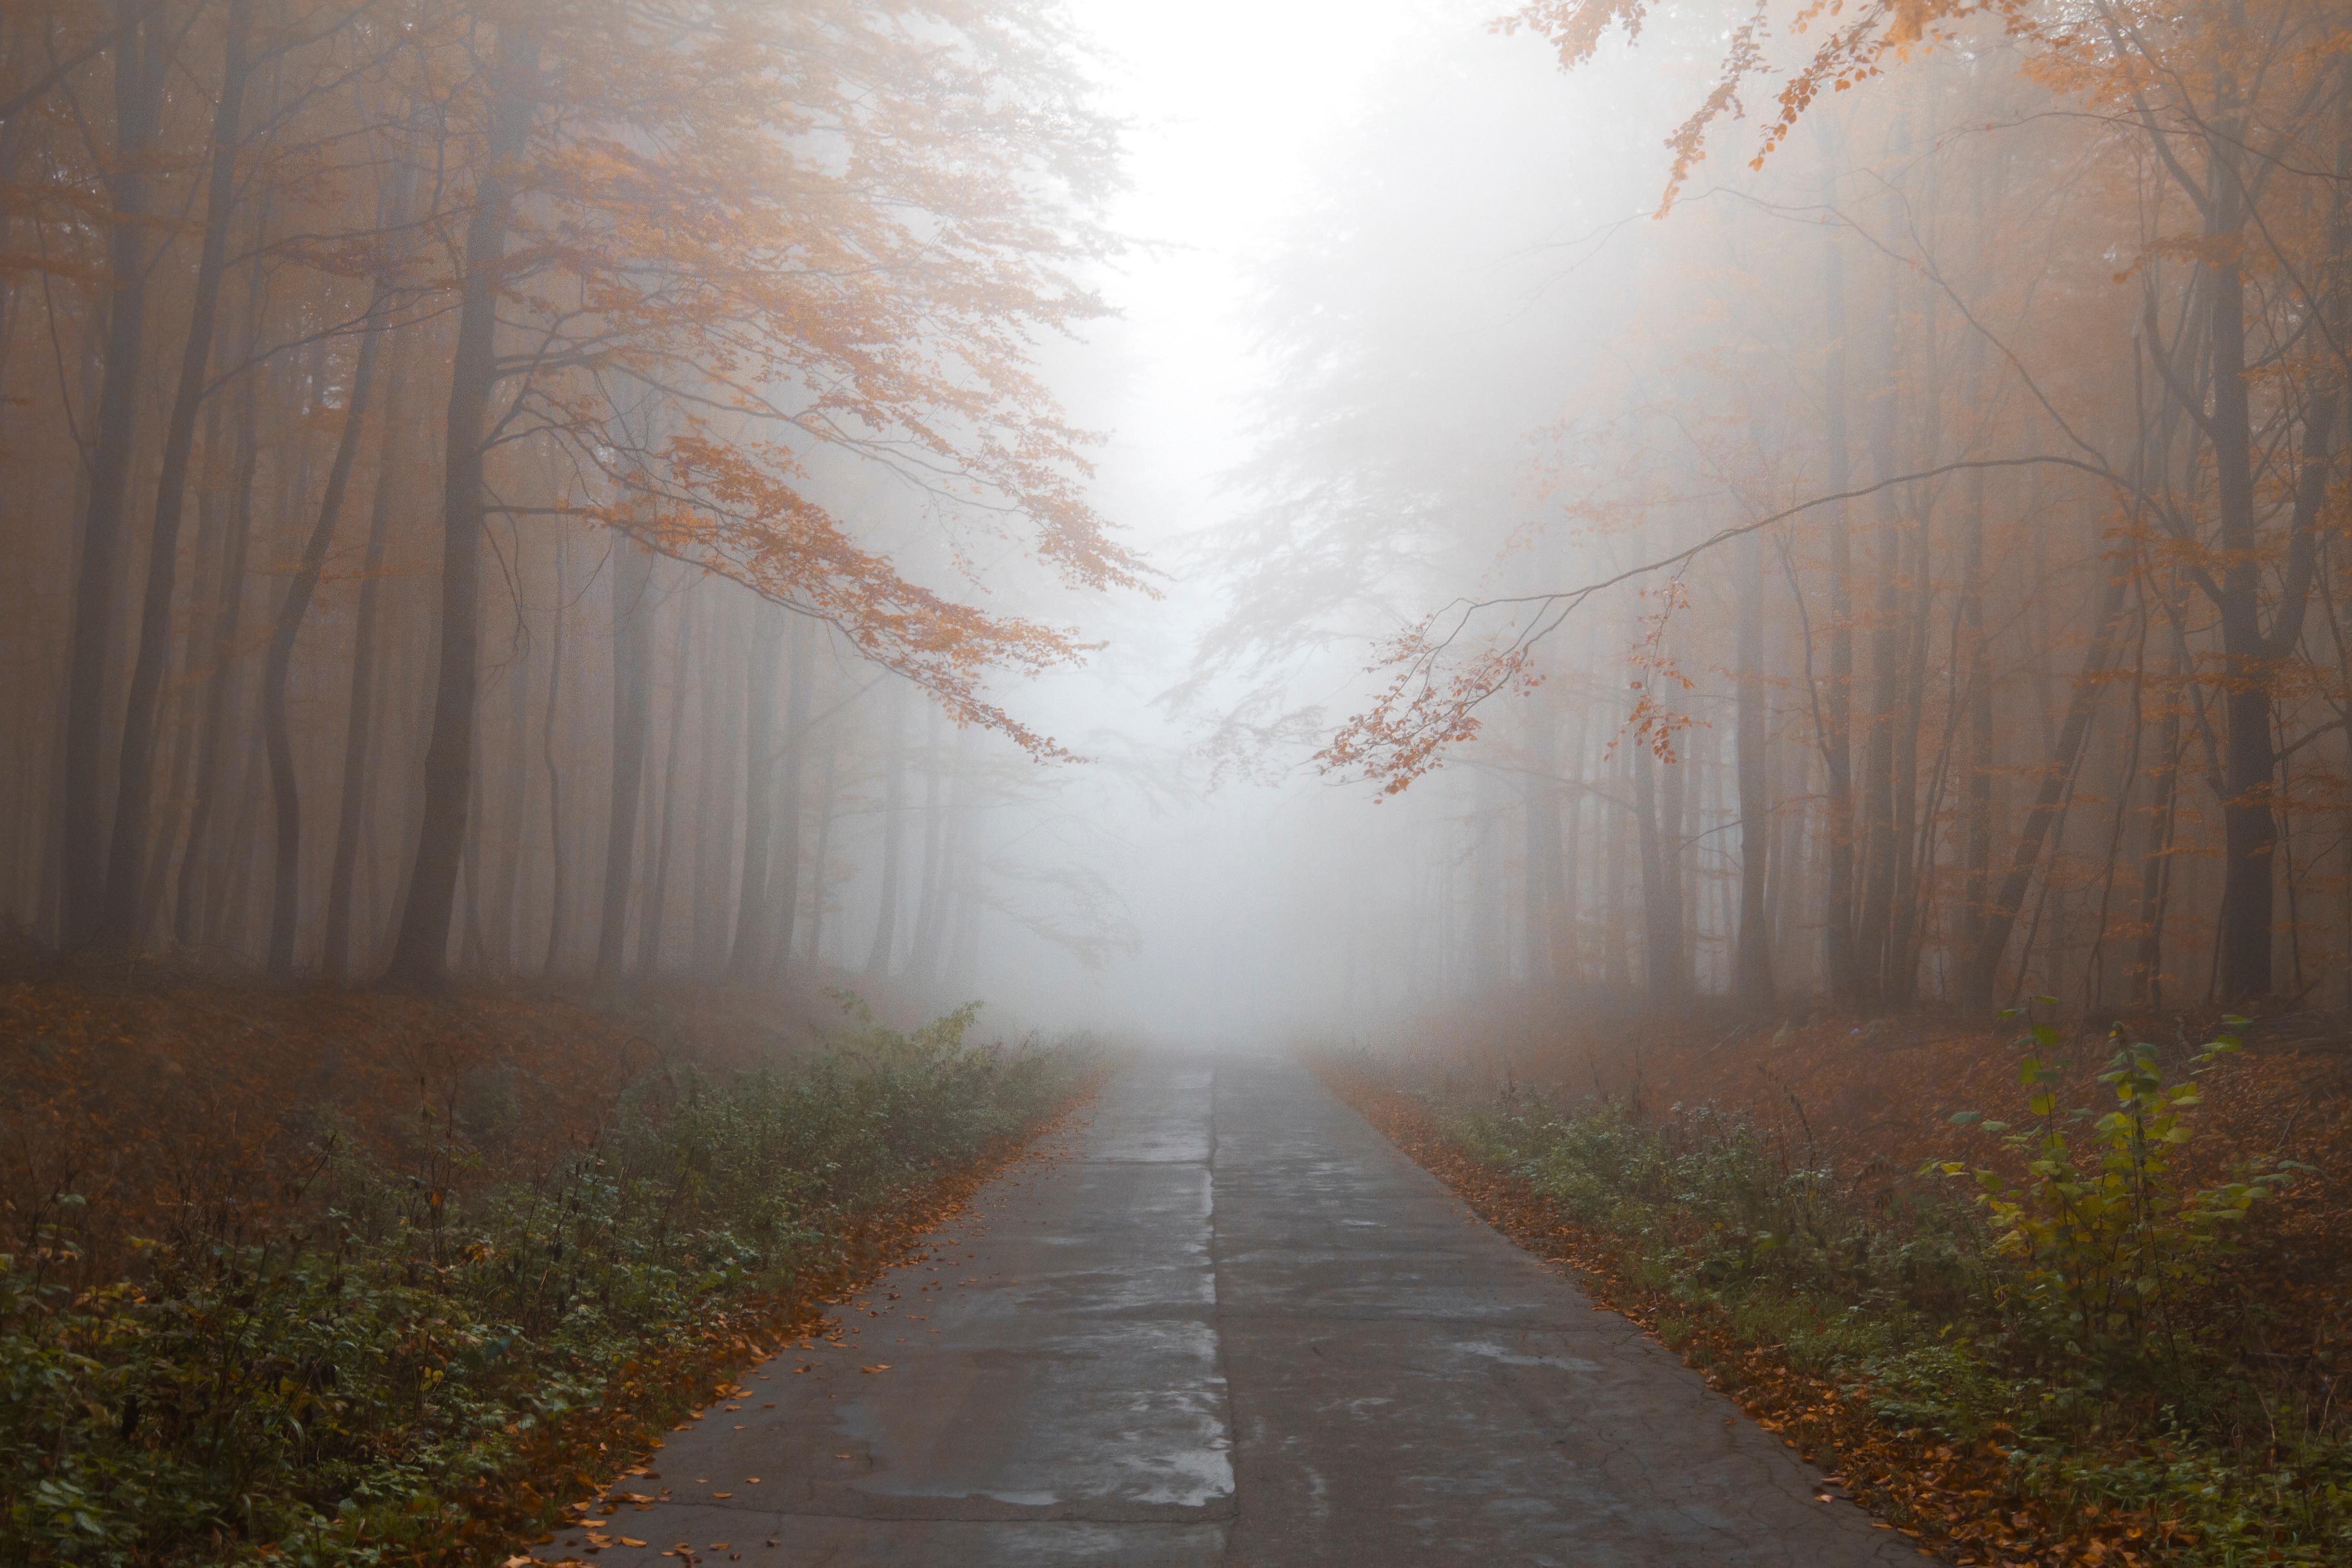 картинки сильного тумана предполагают